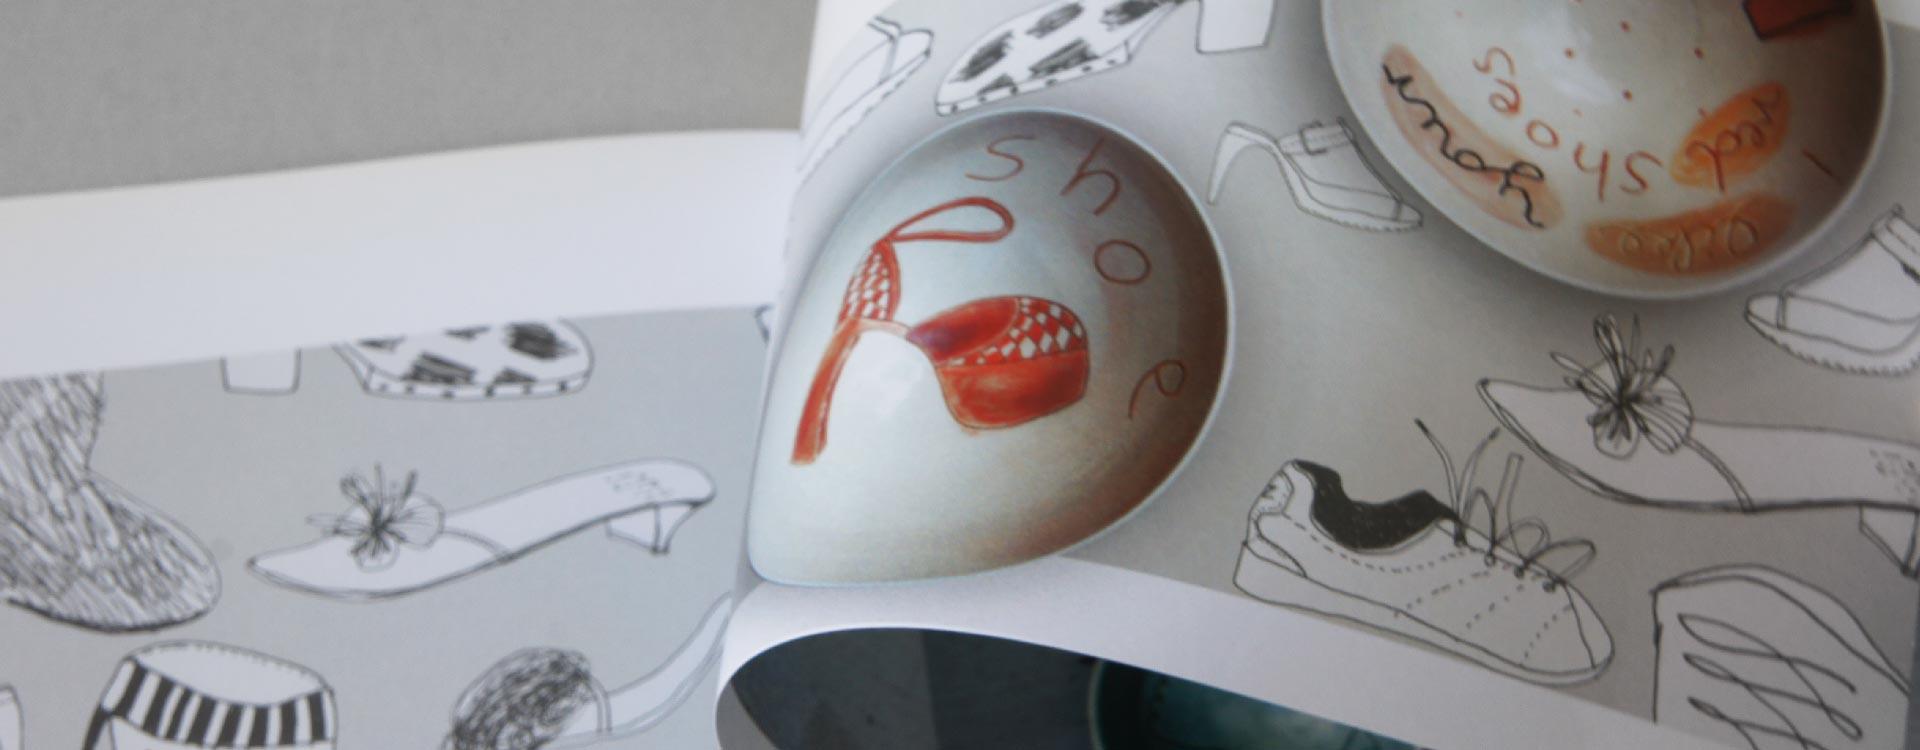 Catalogue Stefanie Neumann, Ceramics and Graphics; Design: Kattrin Richter   Graphic Design Studio